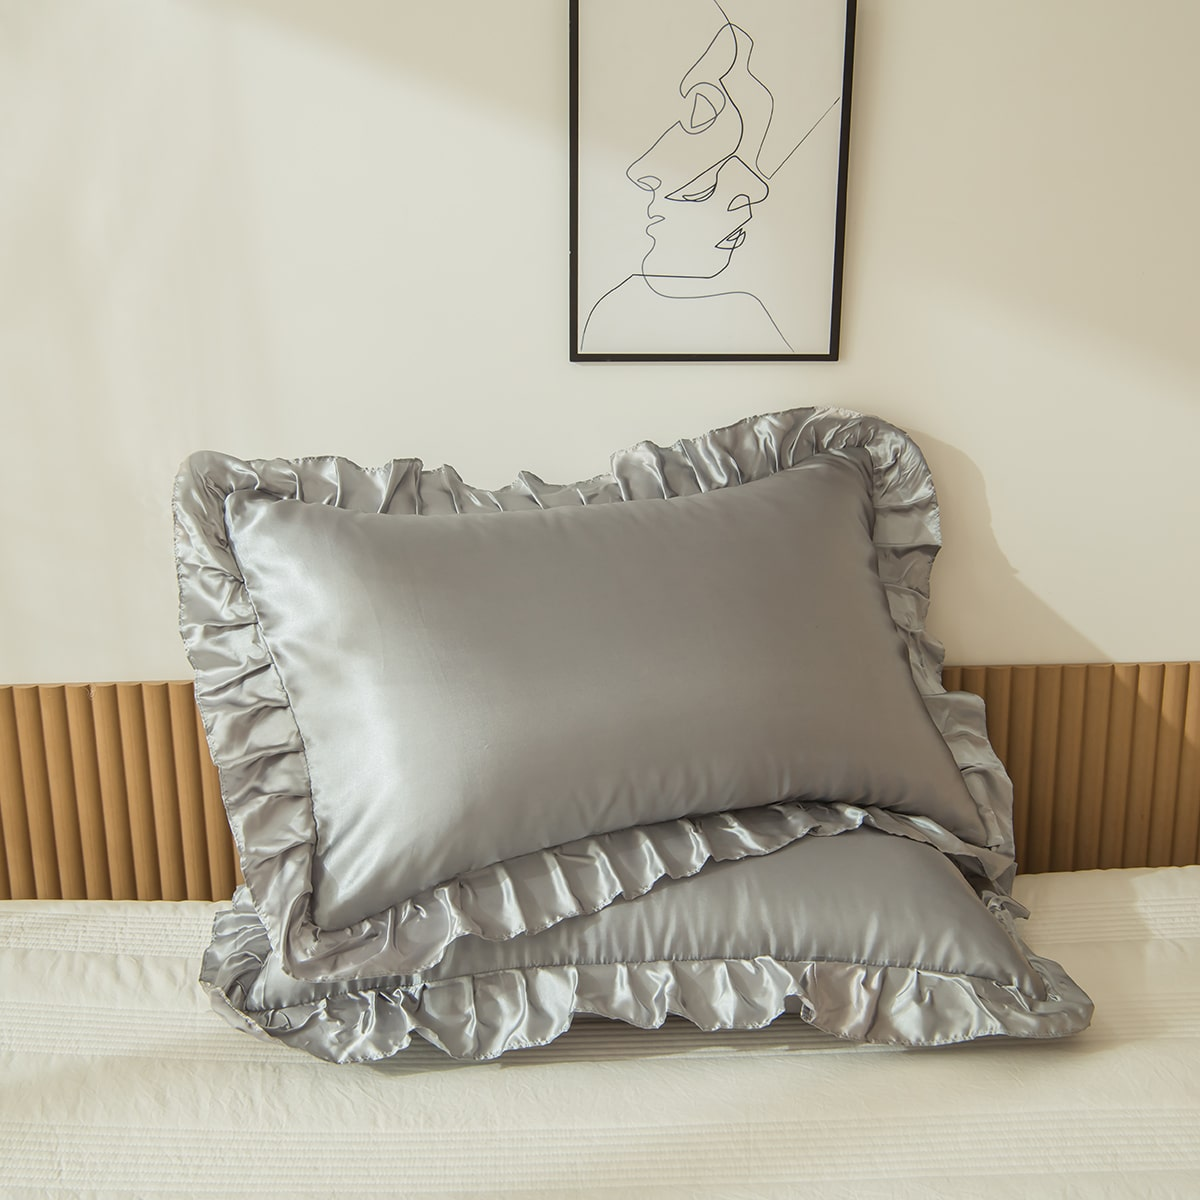 1Pair Satin Ruffle Pillowcase Without Filler